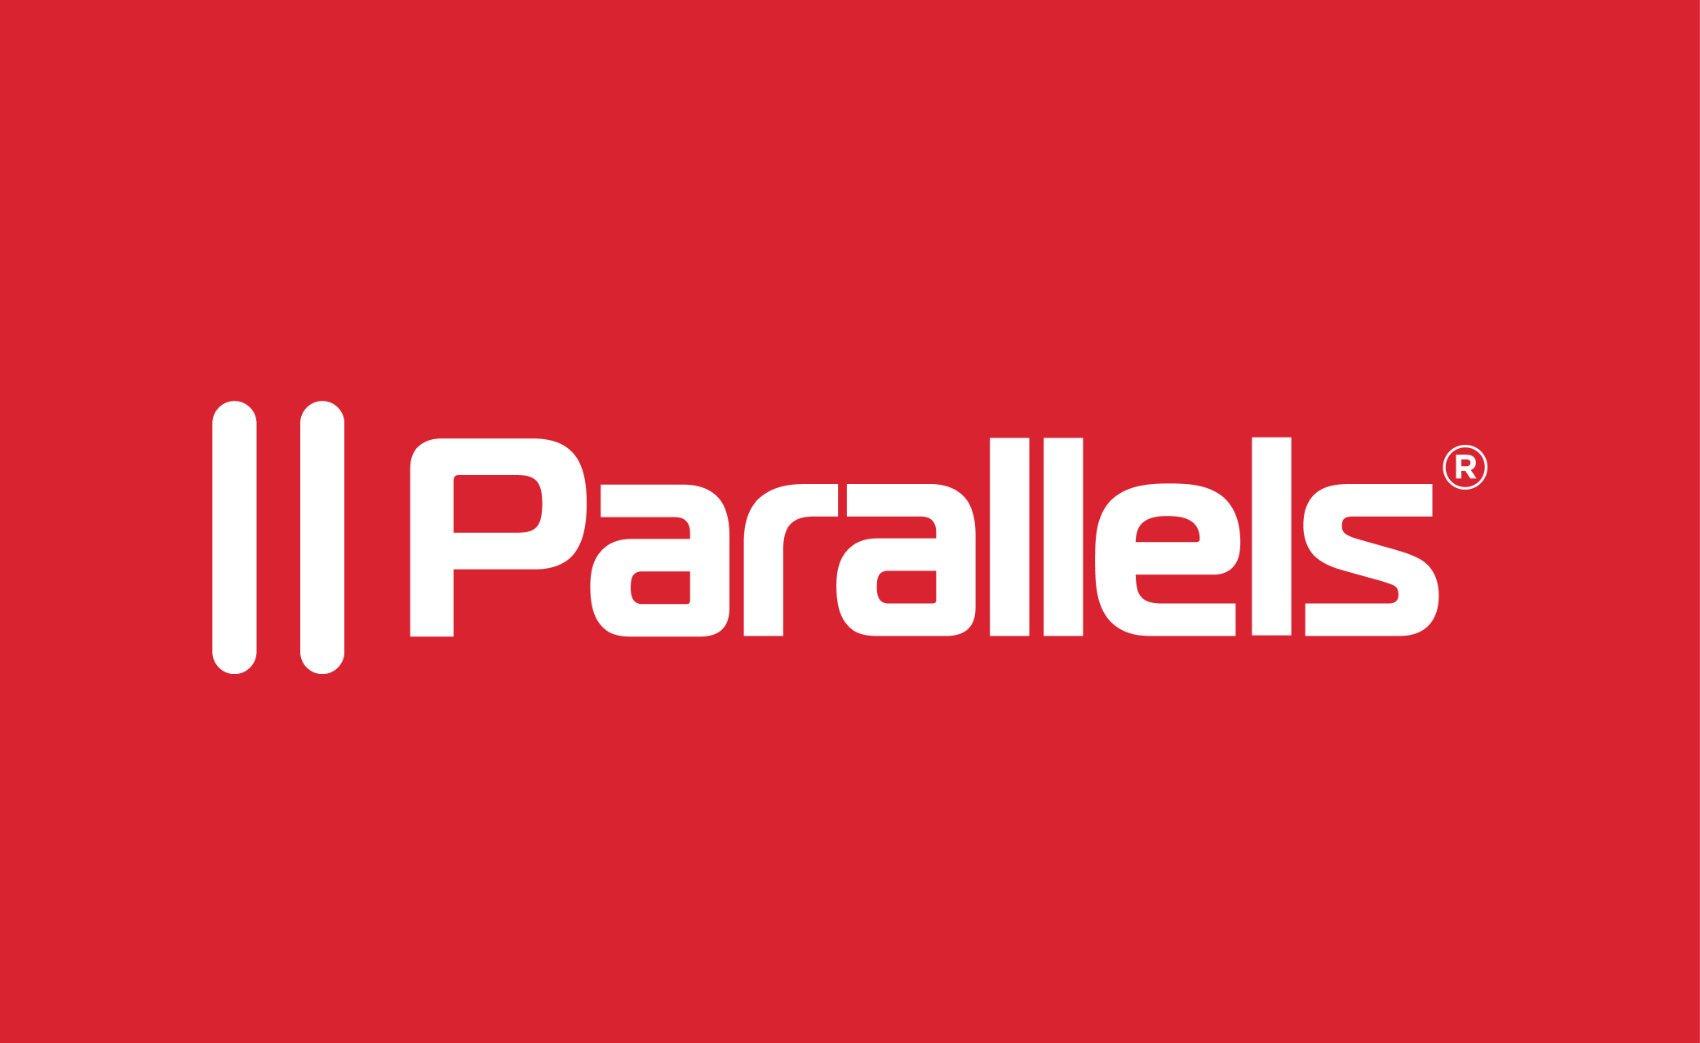 Parallels Logo - Credit Parallels